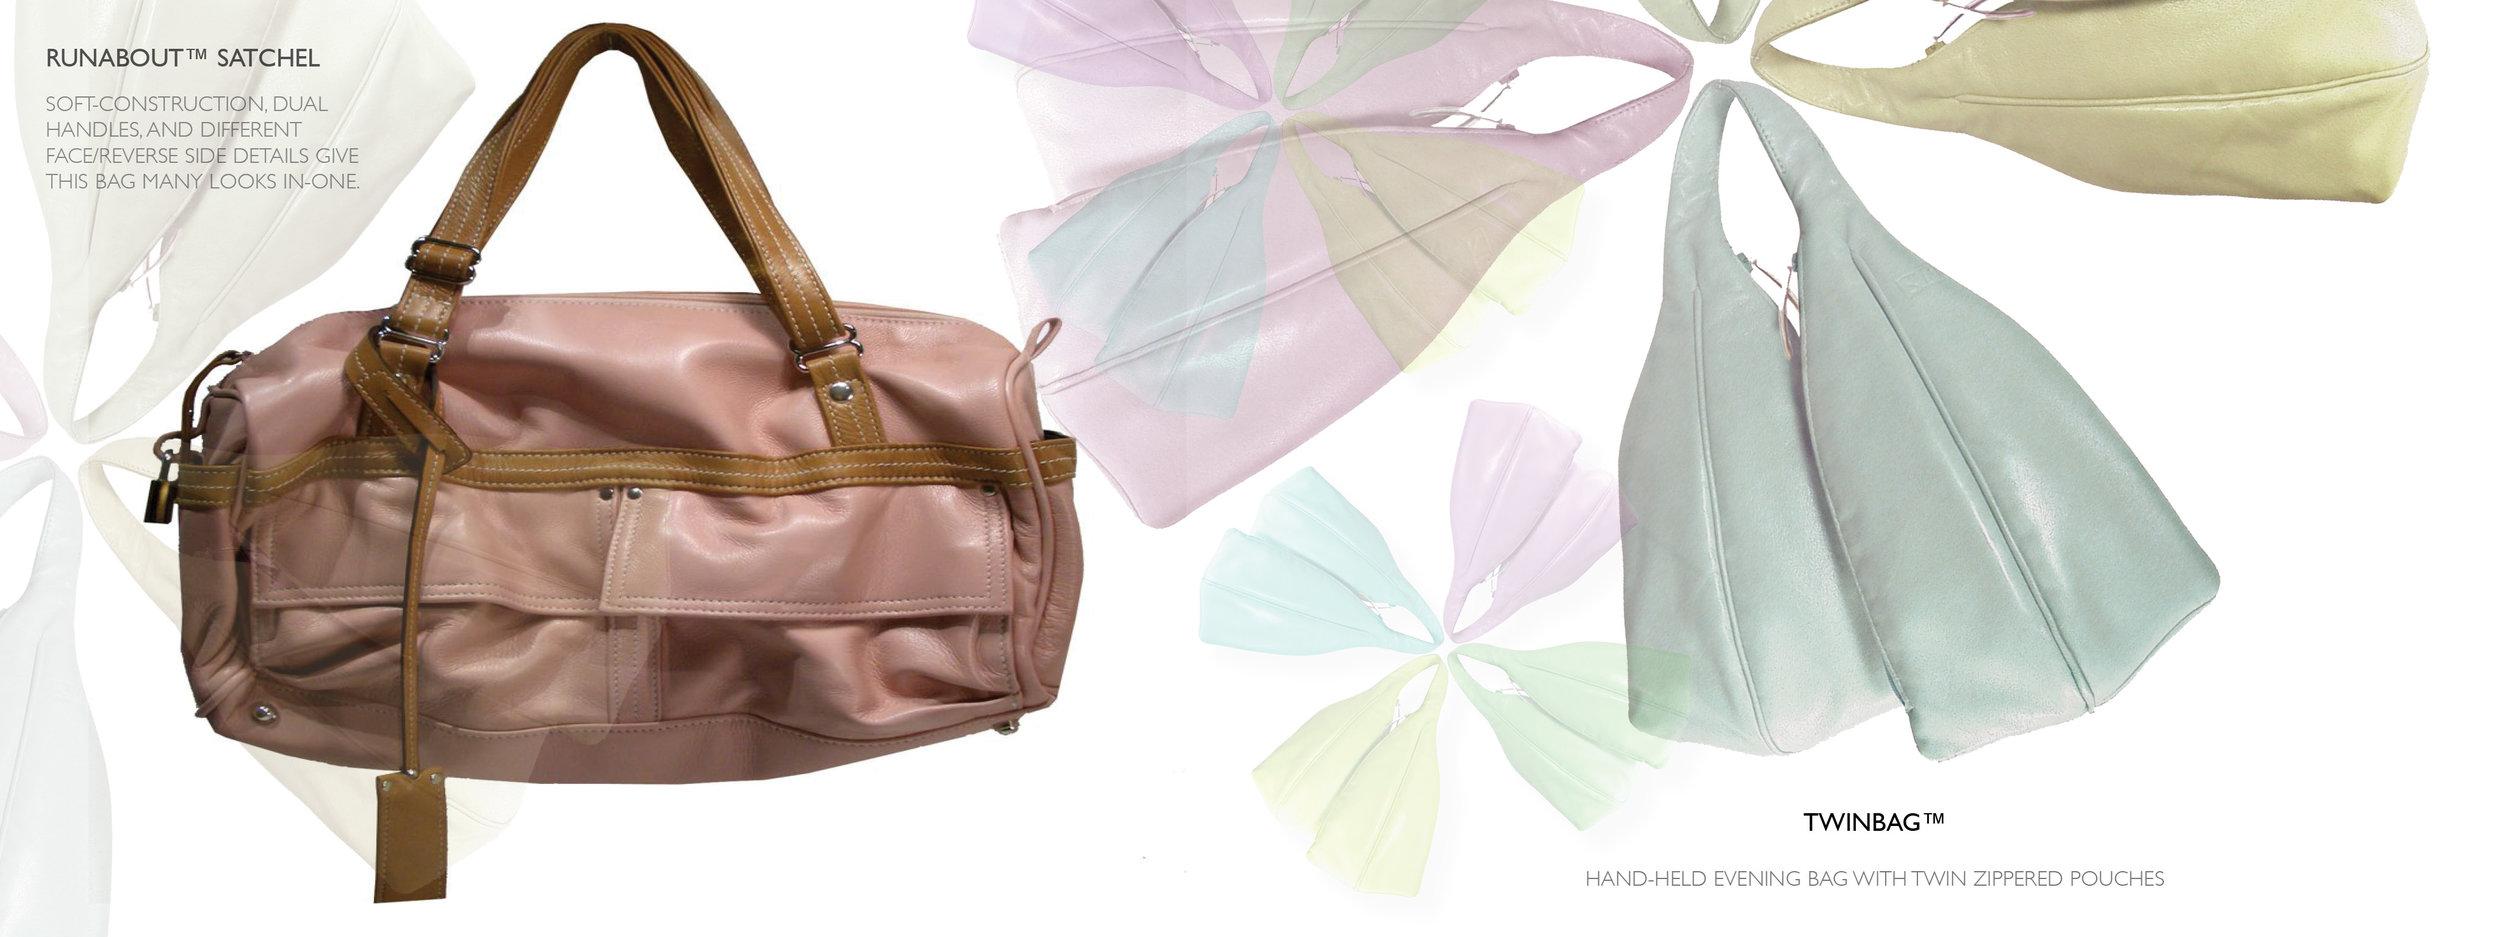 Matt Murphy Handbags & Leathergoods